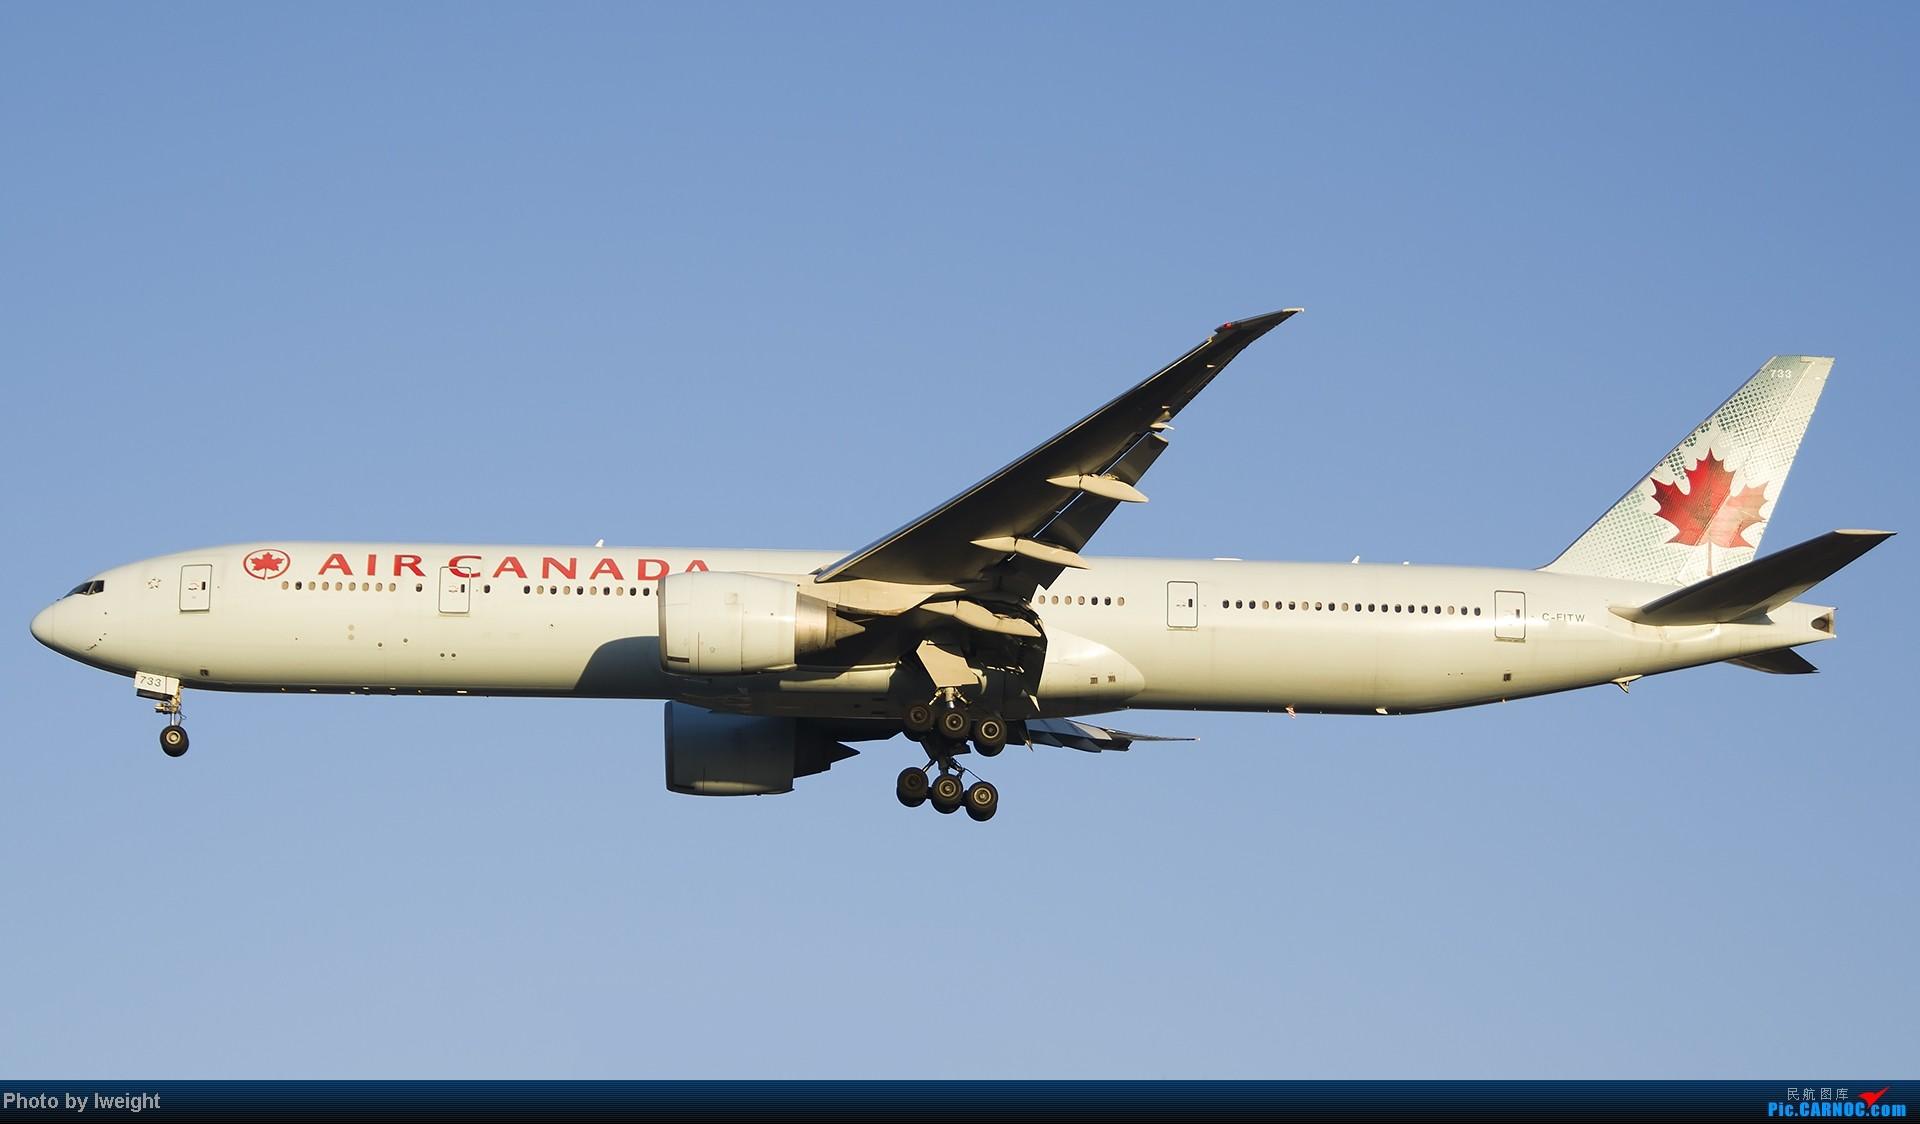 Re:[原创]抓住APEC蓝的尾巴,再拍上一组 BOEING 777-300ER C-FITW 中国北京首都机场